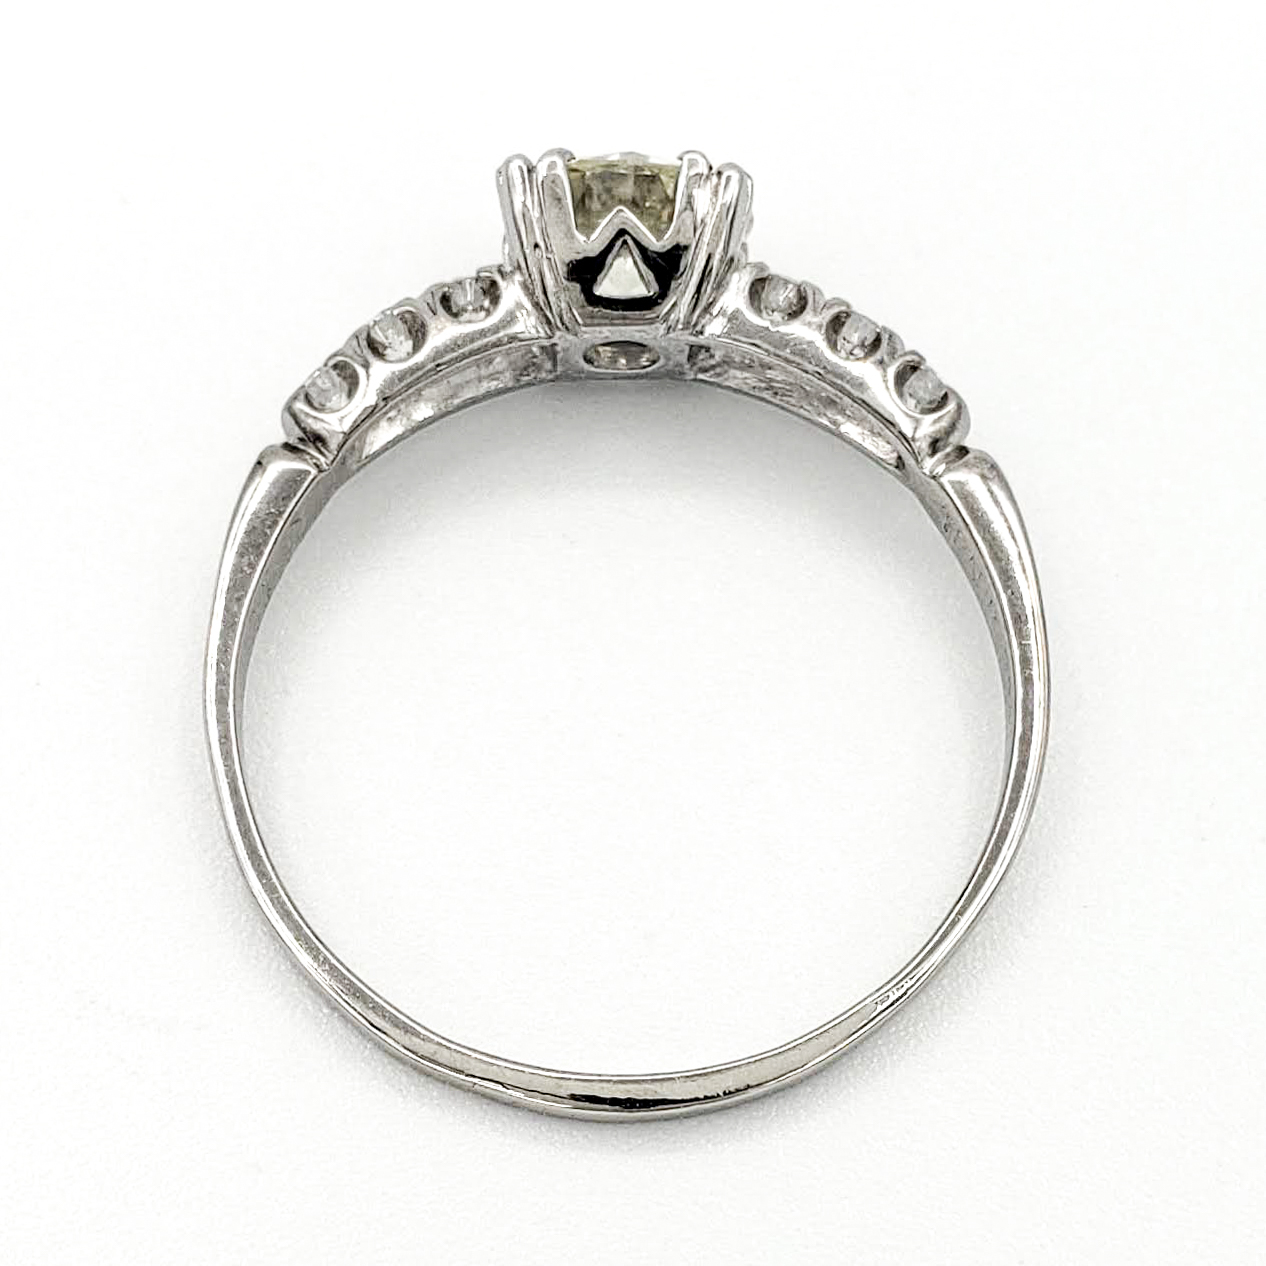 vintage-platinum-engagement-ring-with-0-84-carat-old-european-cut-diamond-egl-l-vs1